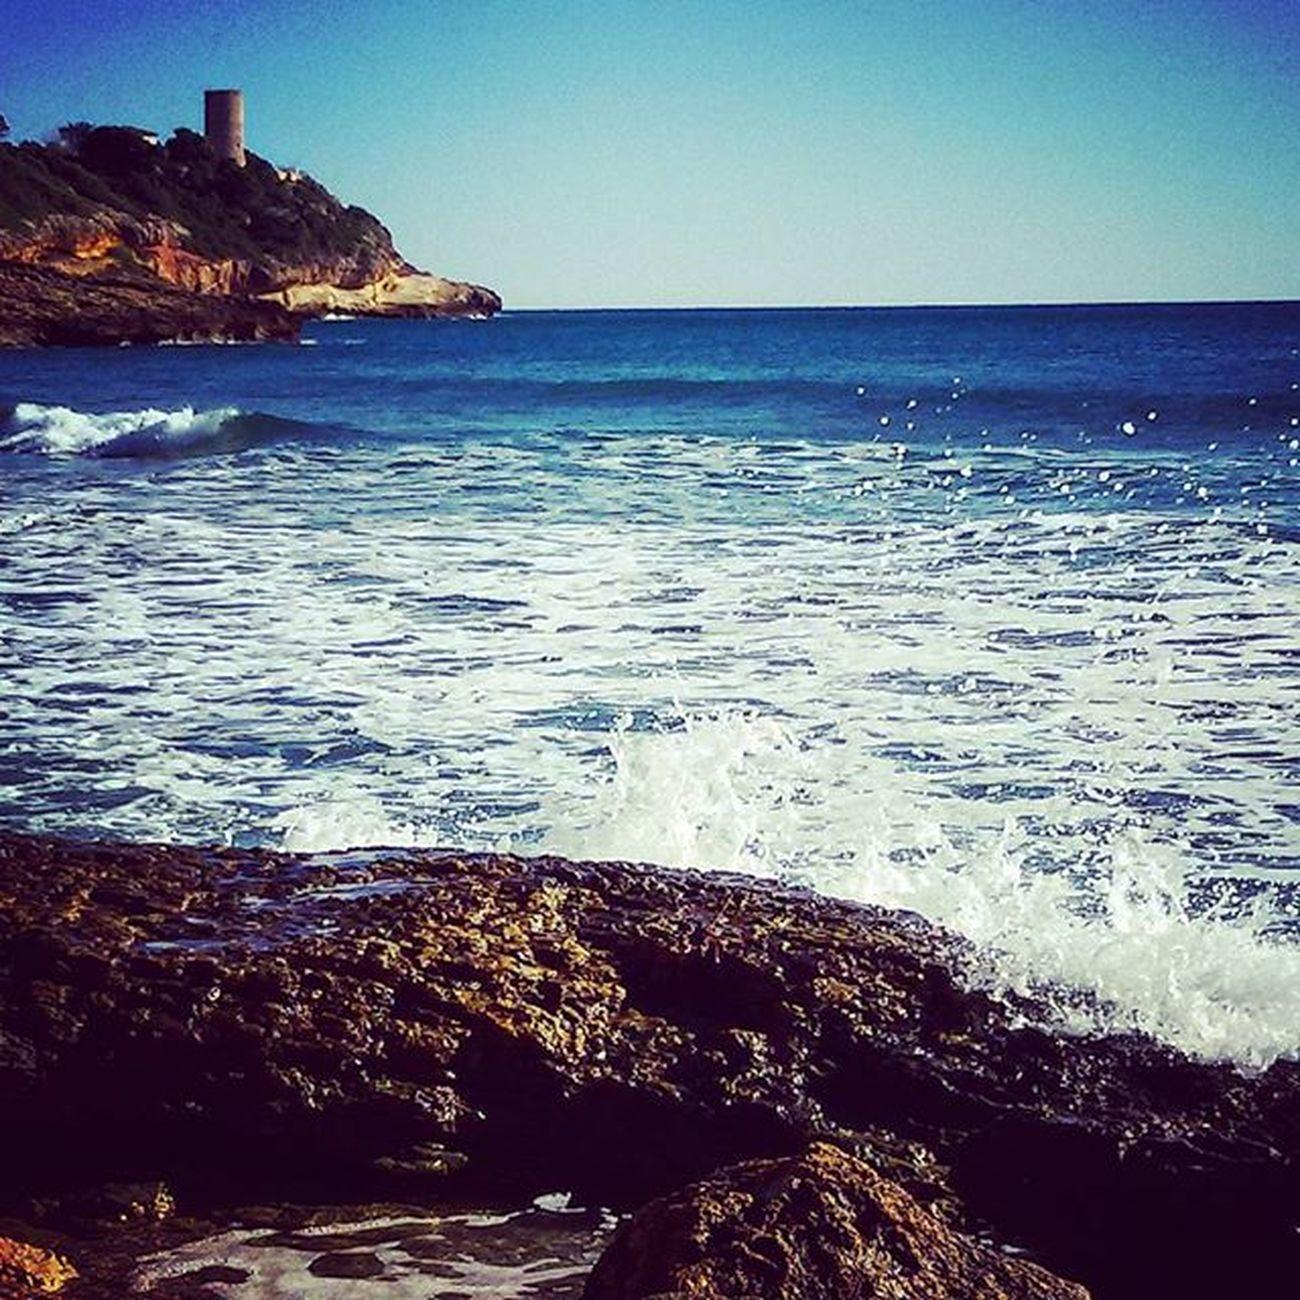 Raconsde_catalunya Boscdelamarquesa Puntadelamora Tarragona Tgnturisme Tgn Tarragona2016 Descobreixcatalunya Descobreixtarragona Raconsde_tarragona